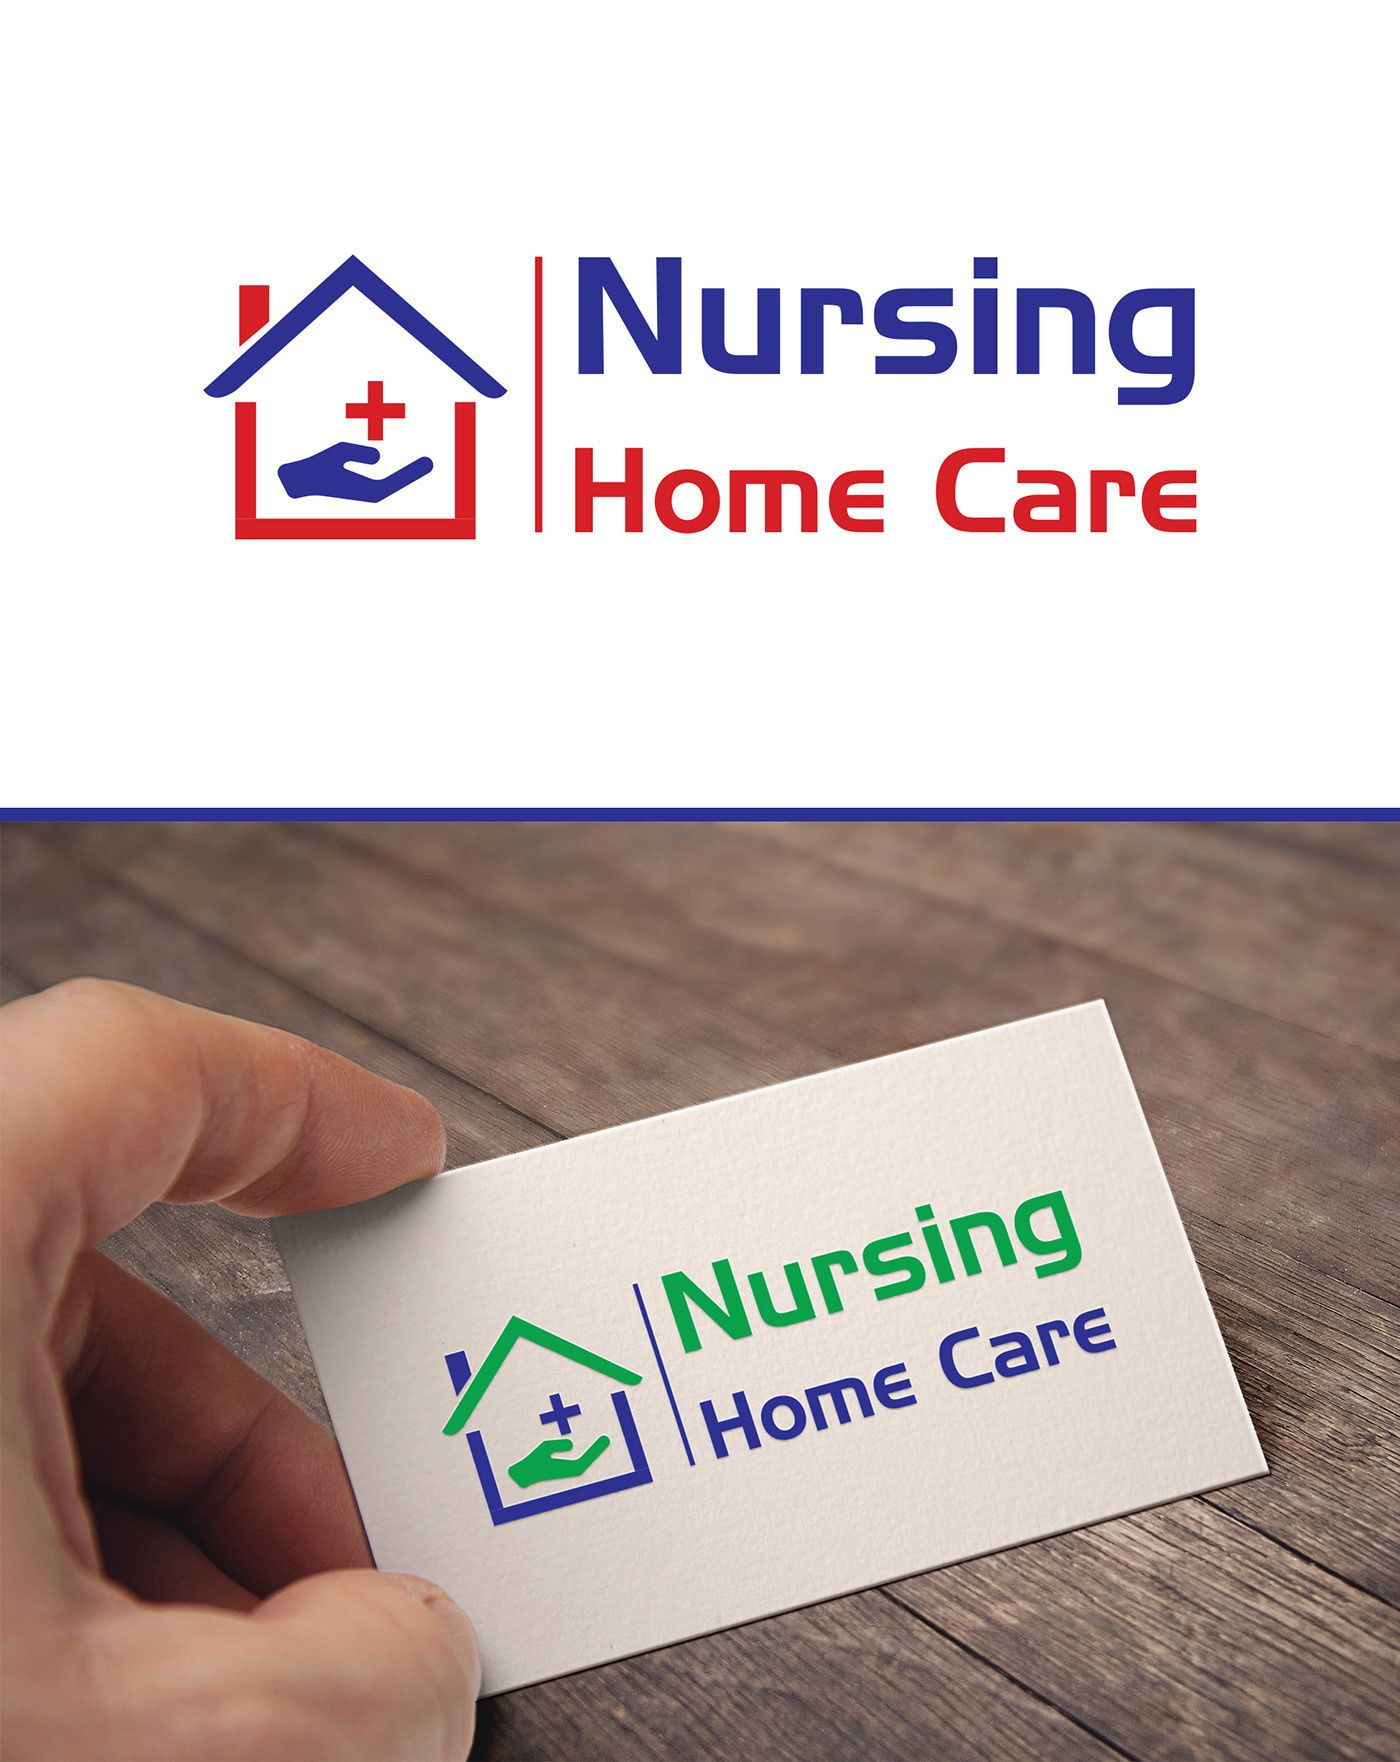 Decouvrez Ce Projet Behance Logo Design Nursing Home Care Https Www Behance Net Gallery 64544659 Log Nursing Home Care Nursing Home Home Health Care